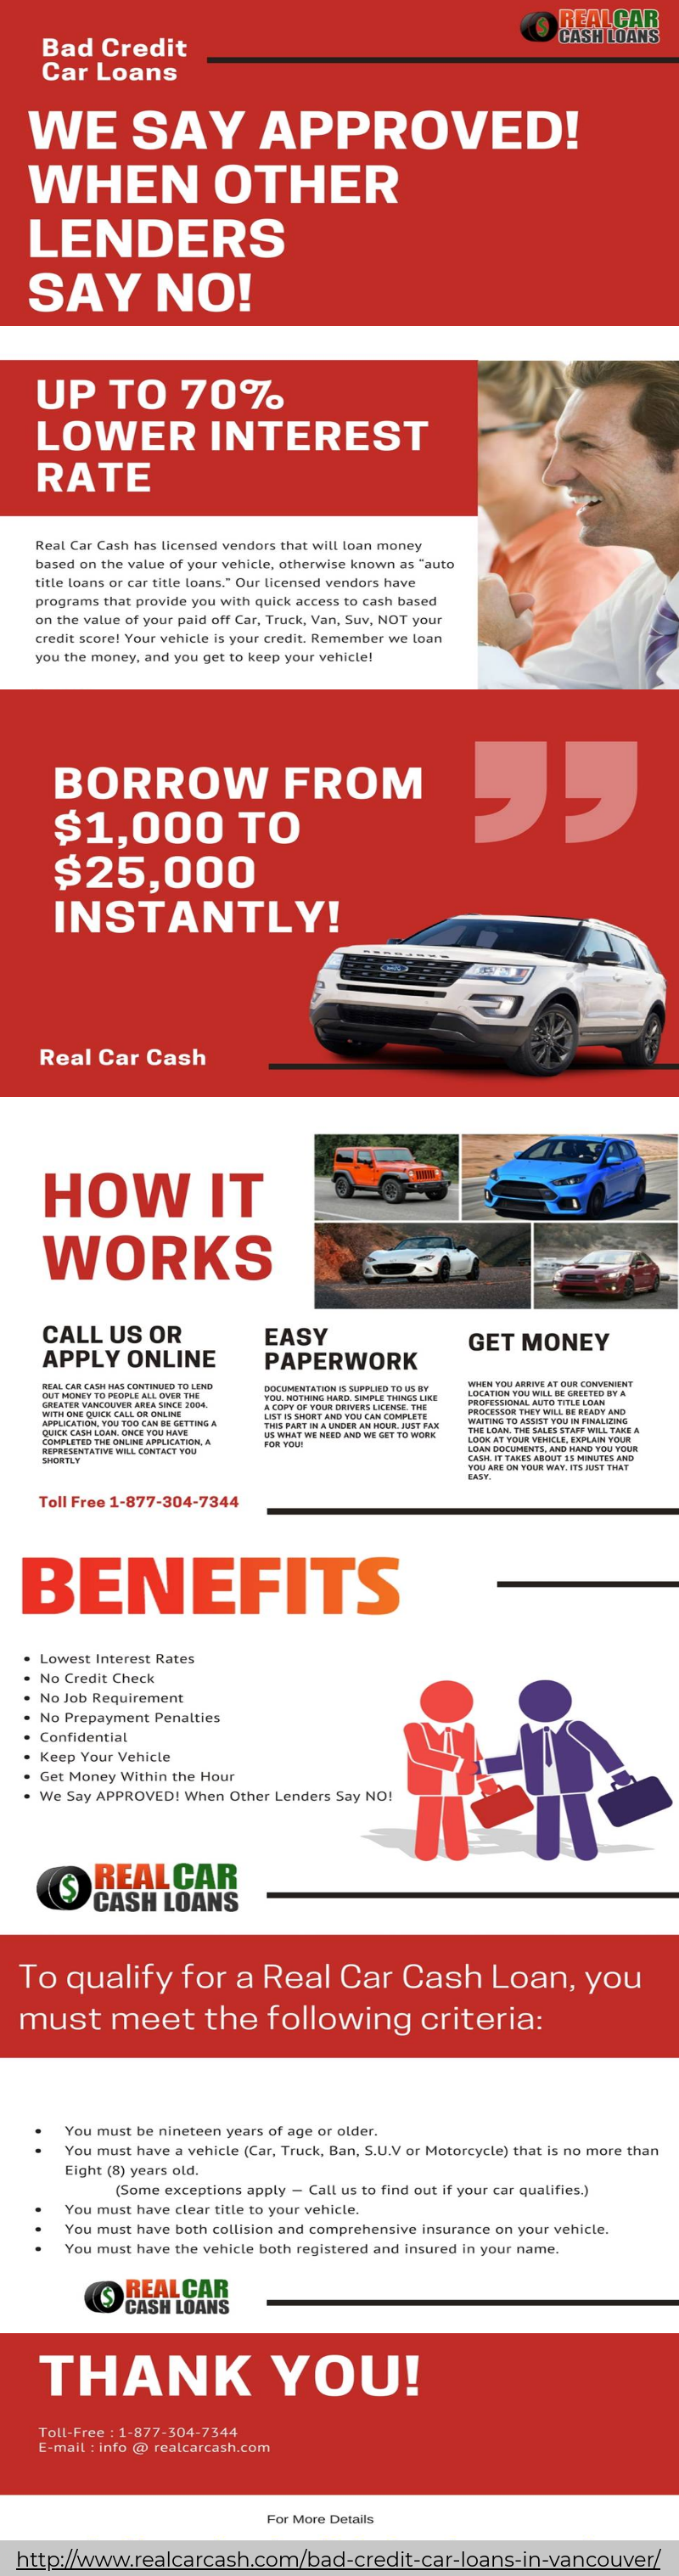 Bad Credit Car Loans In Vancouver Short Term Bad Credit Personal Loans Lender Bad Credit Car Loan Bad Credit Car Loans